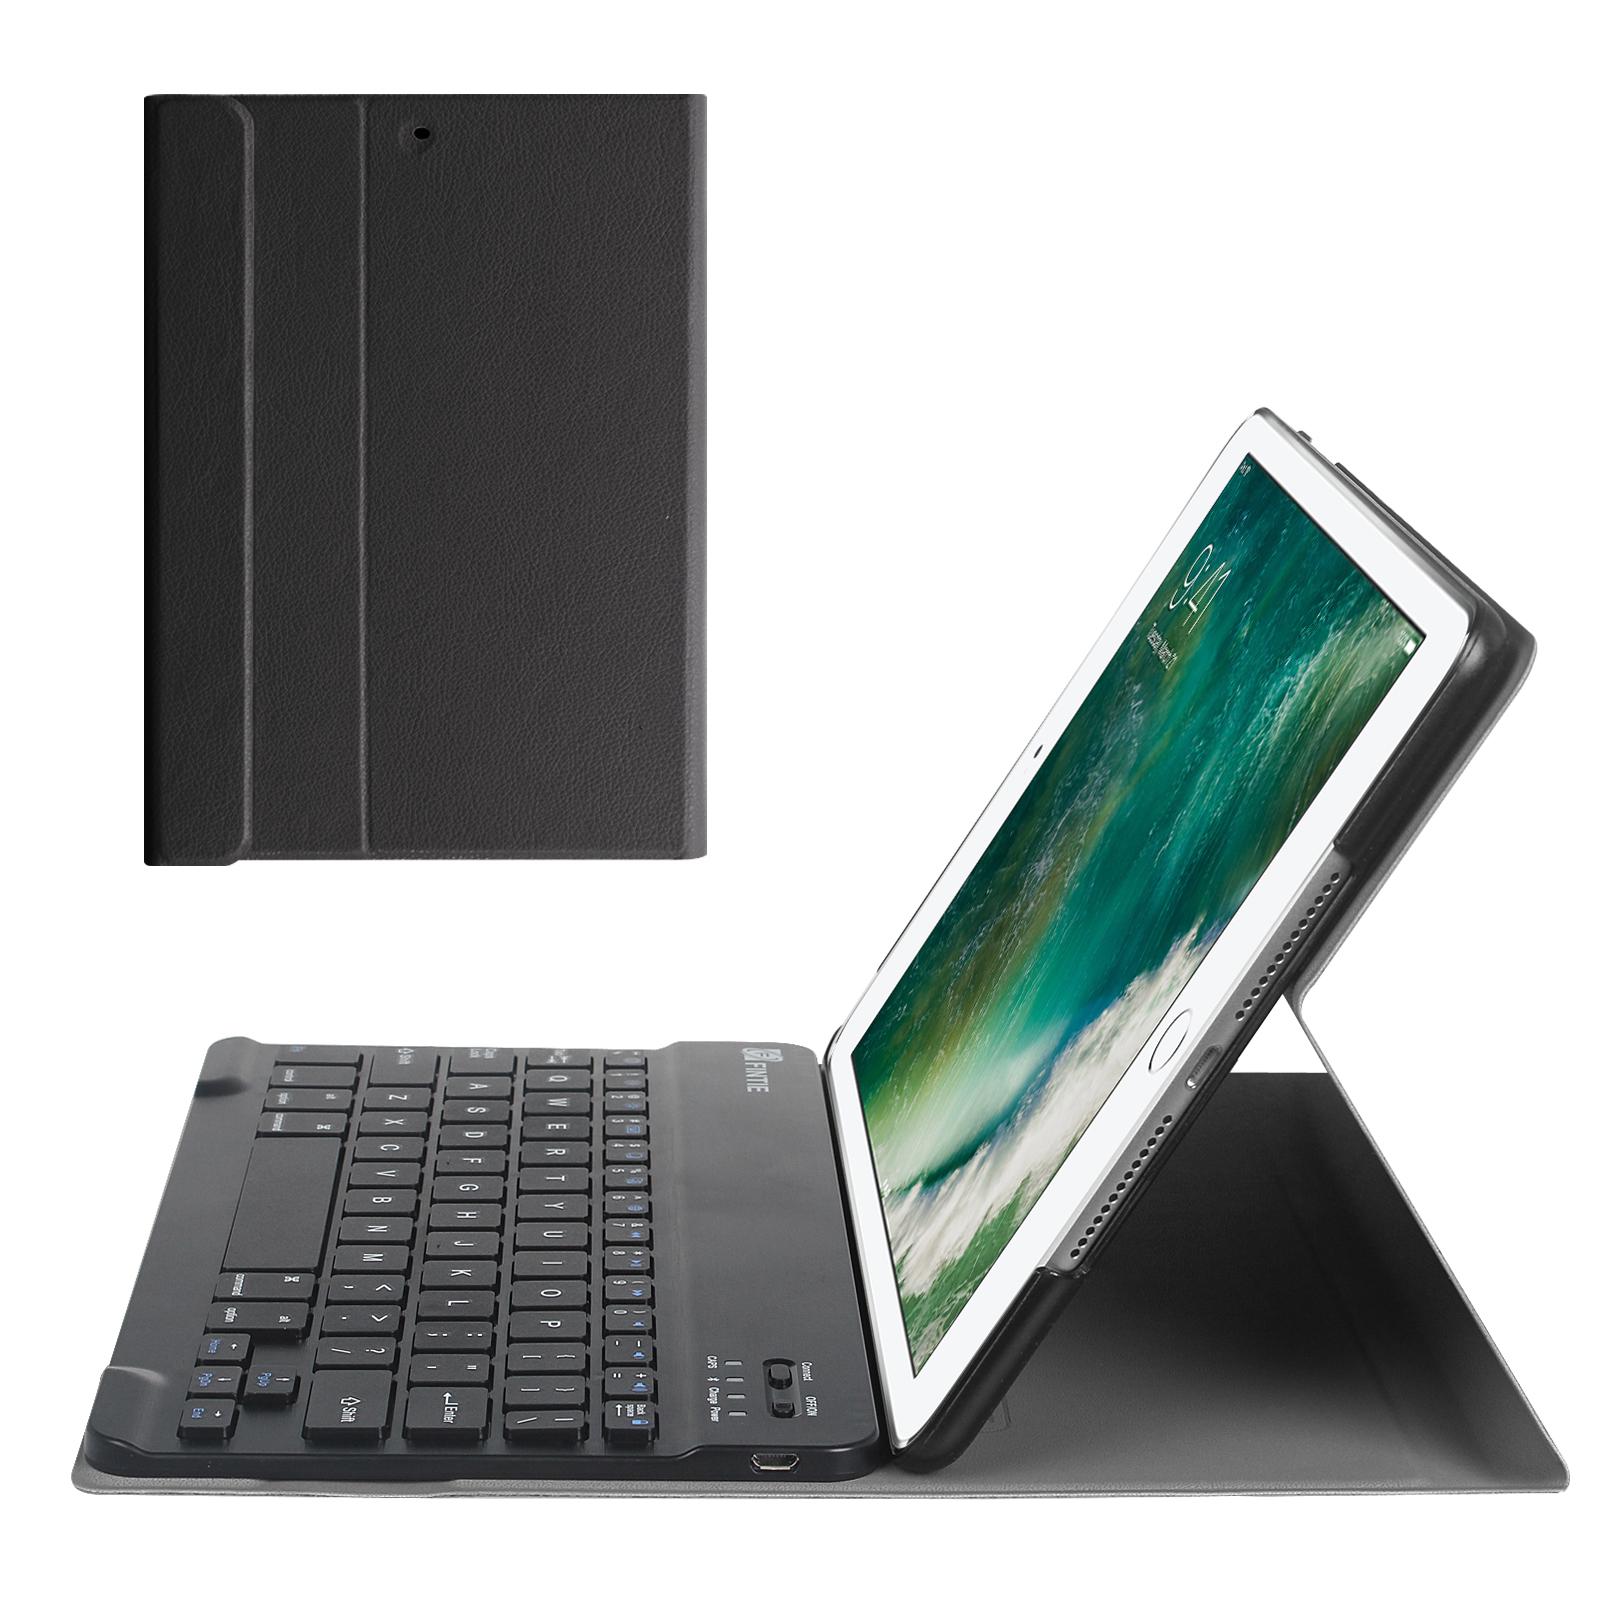 Fintie SlimShell Keyboard Case Cover for iPad 9.7 Inch 6th Gen 2018 / 5th Gen 2017 / iPad Air 2 / iPad Air, Black